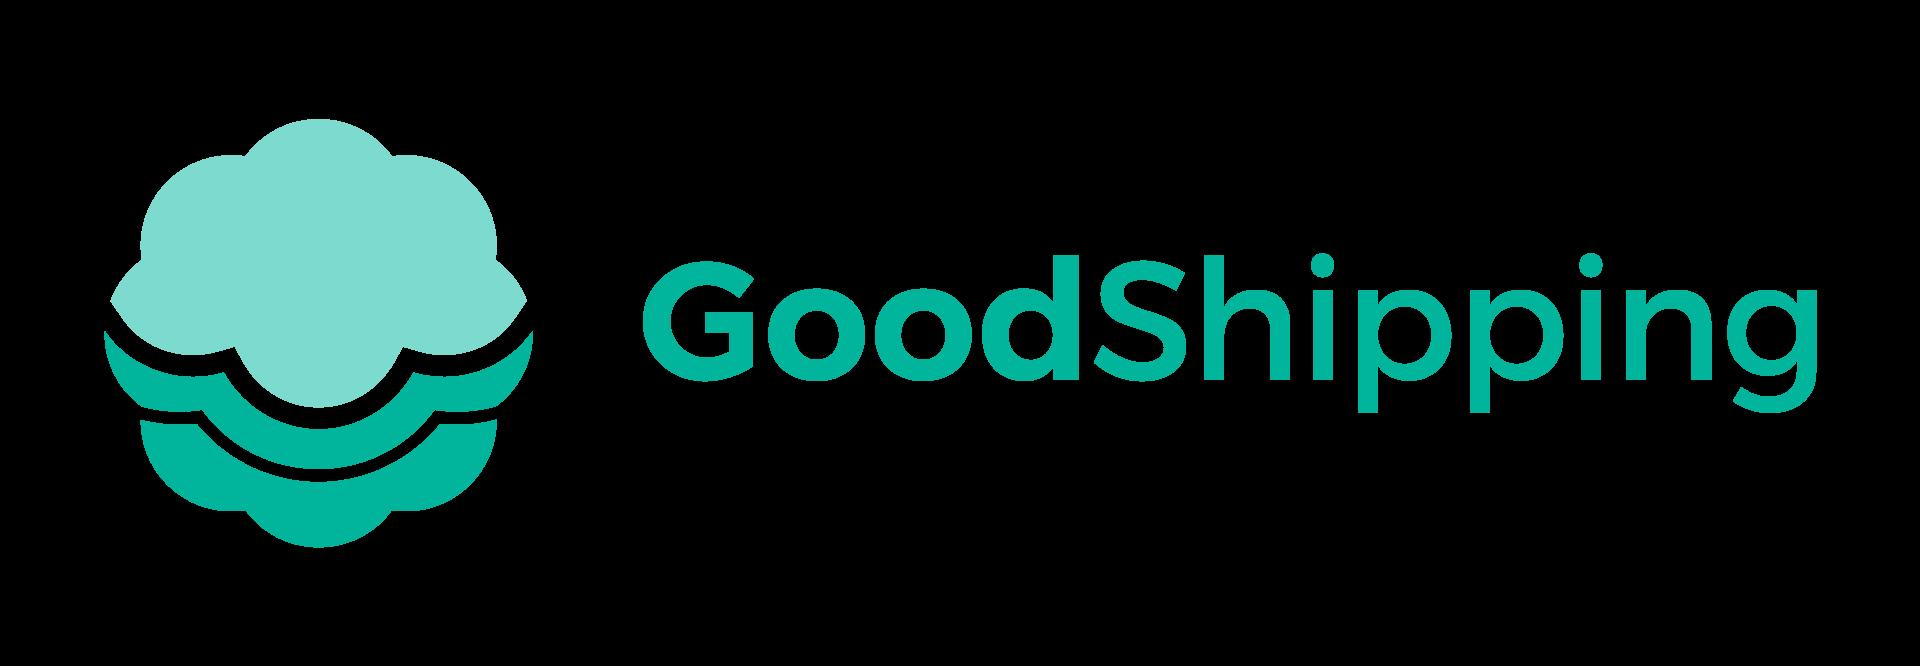 Goodshipping